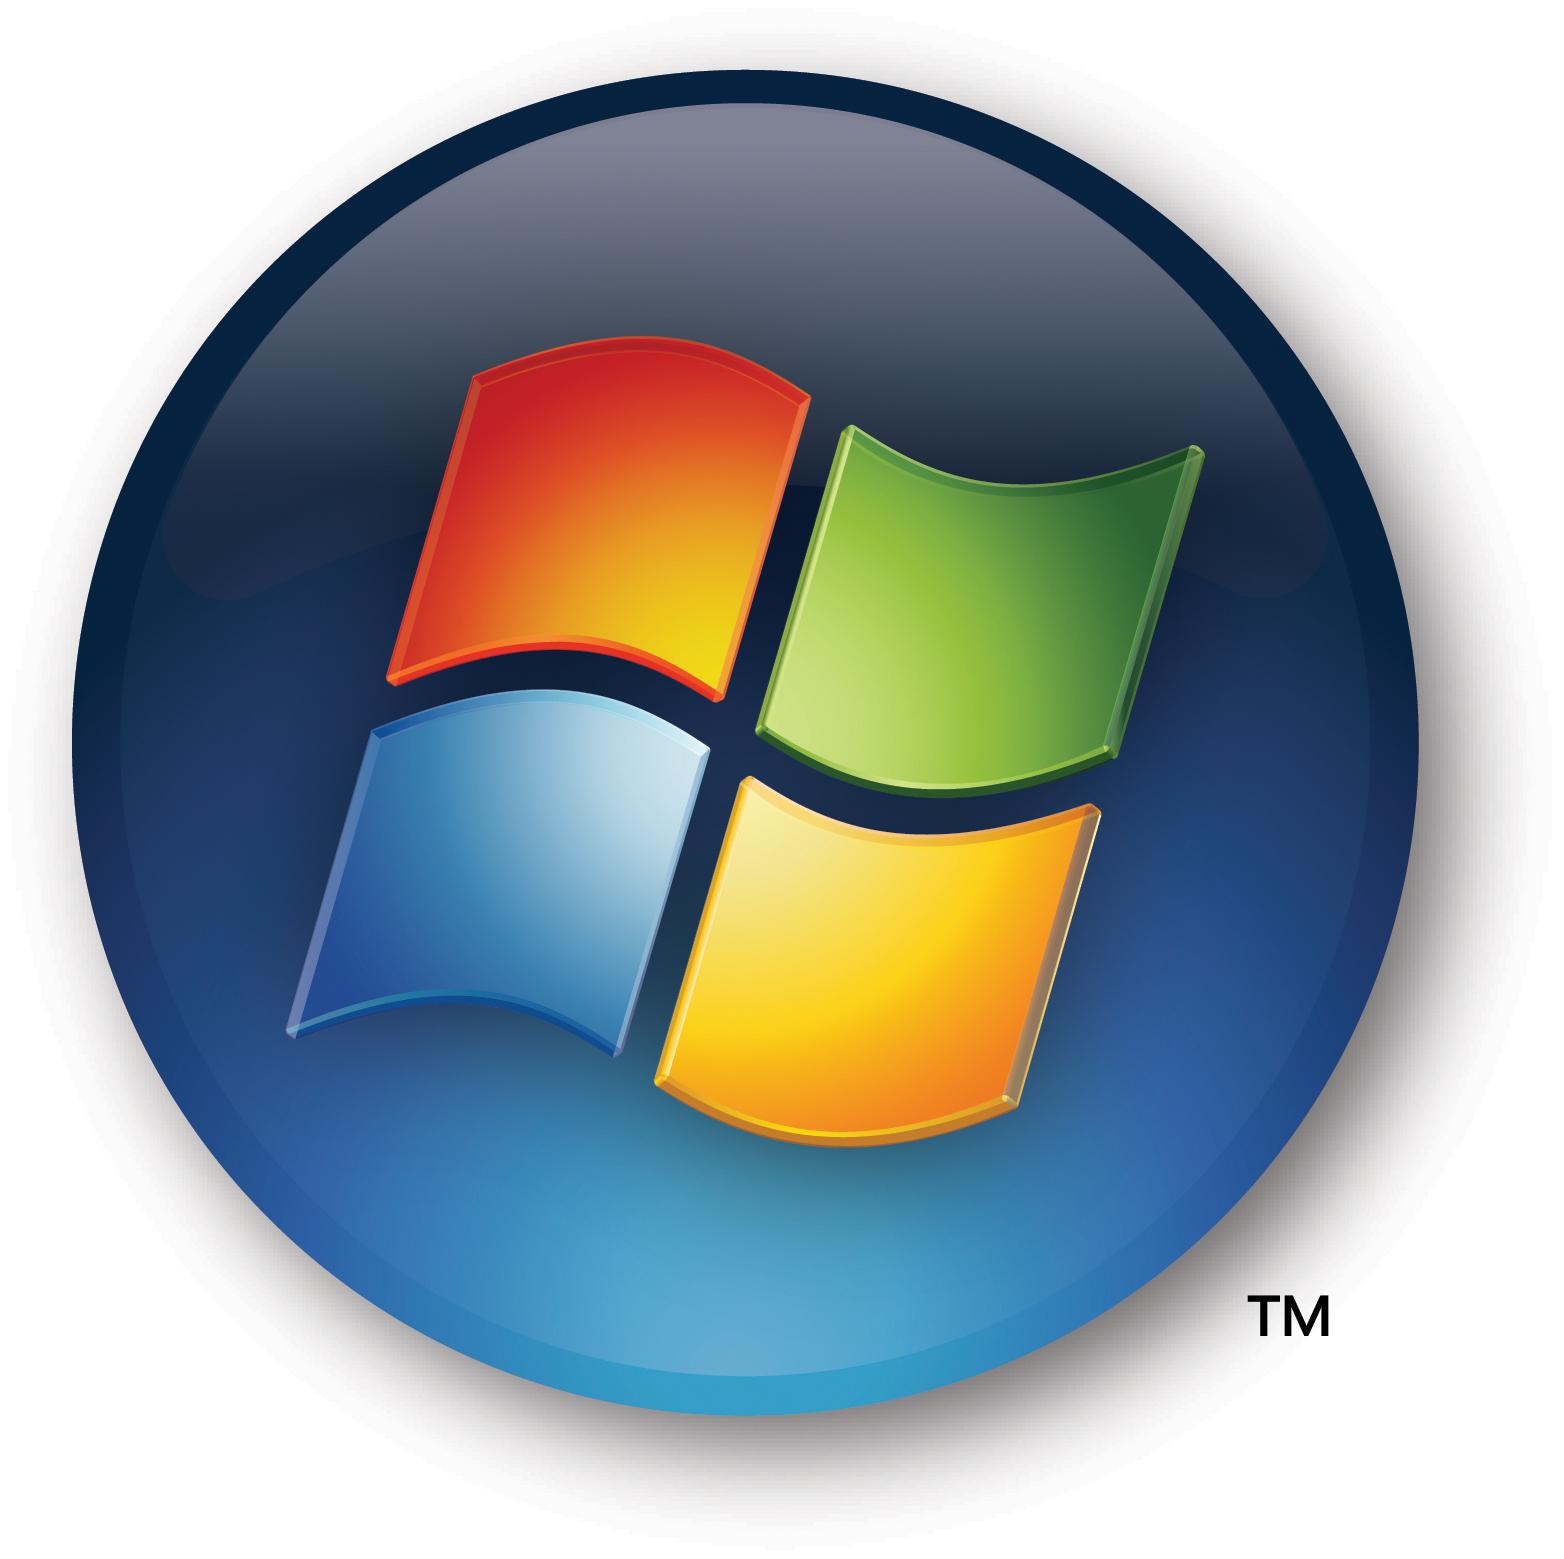 Windows 7 Start Button Logo